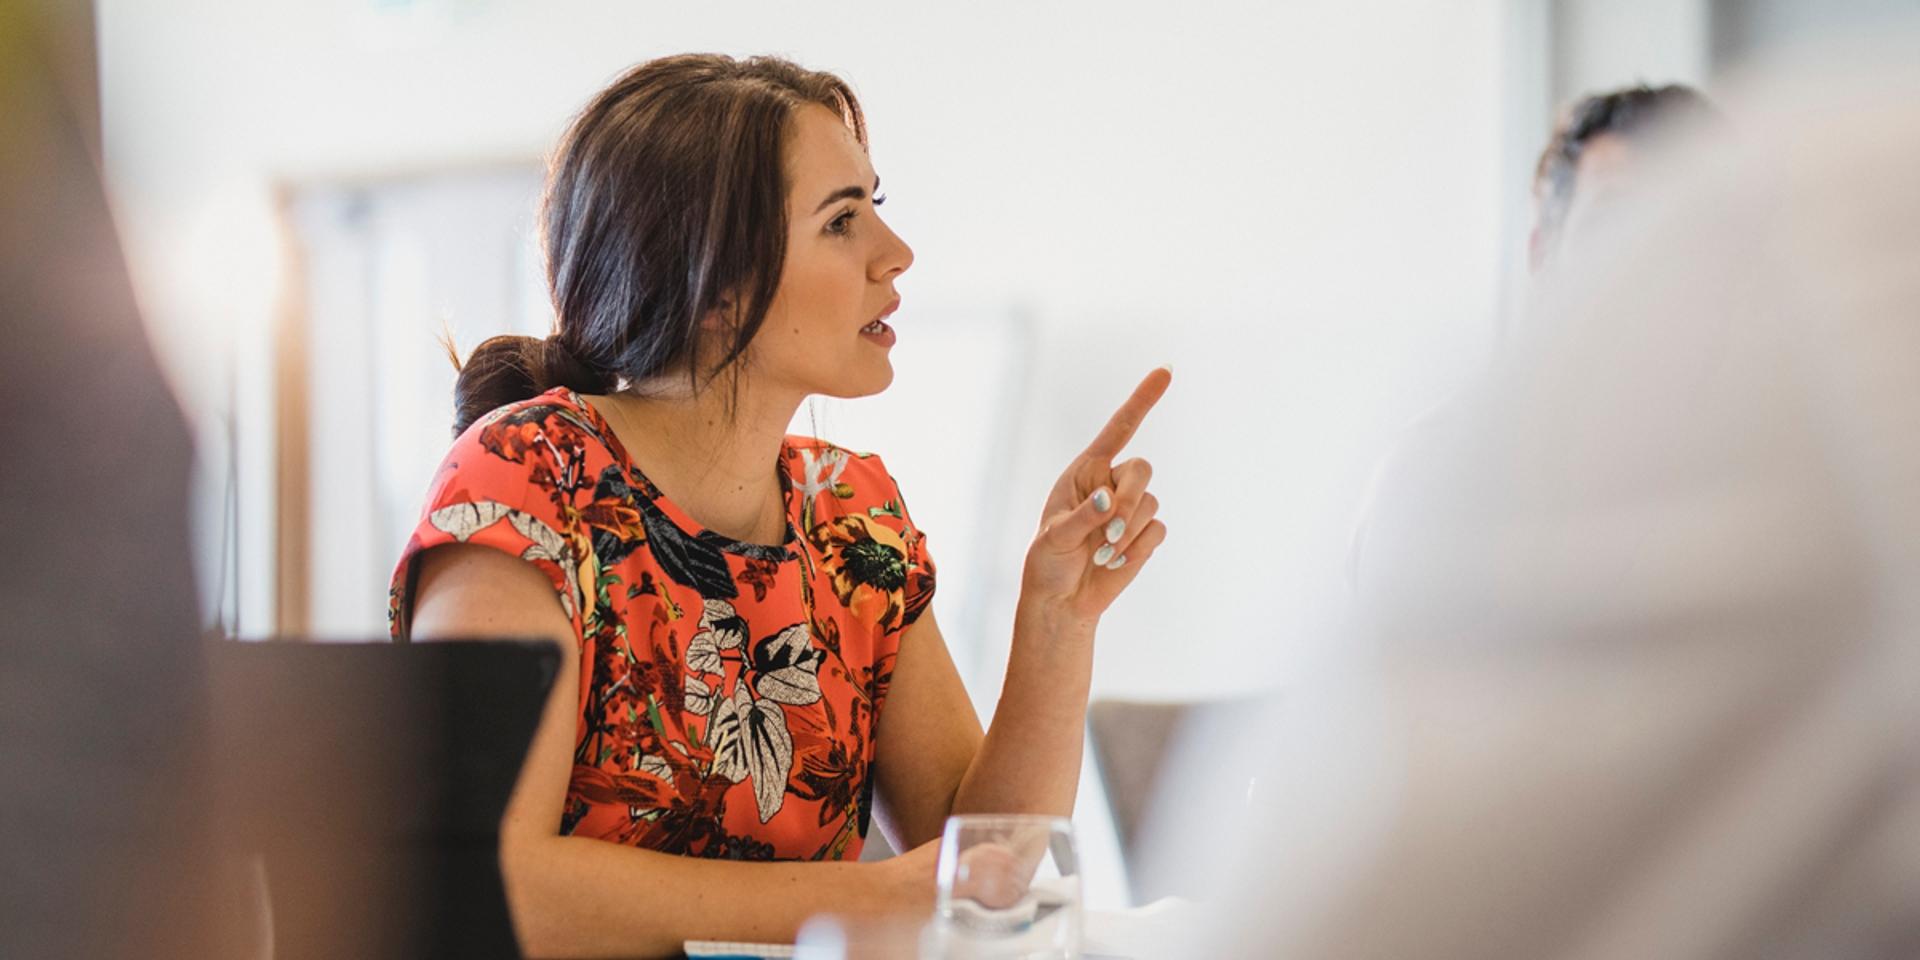 Domaine expertise droit- Agence placement et recrutement